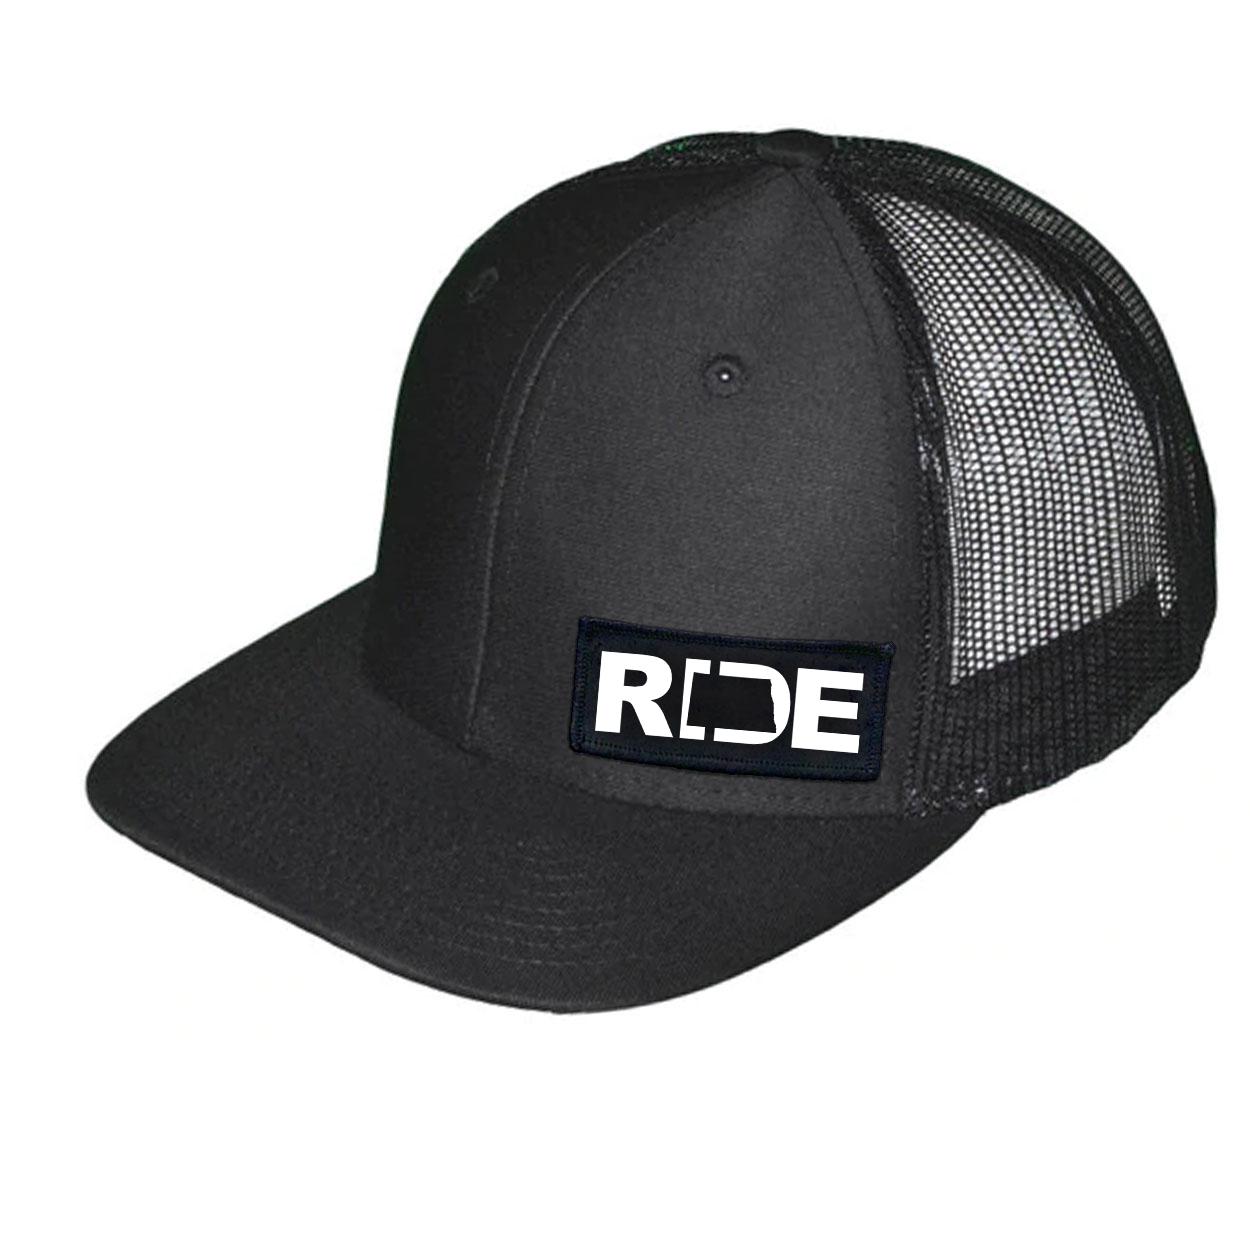 Ride North Dakota Night Out Woven Patch Snapback Trucker Hat Black (White Logo)